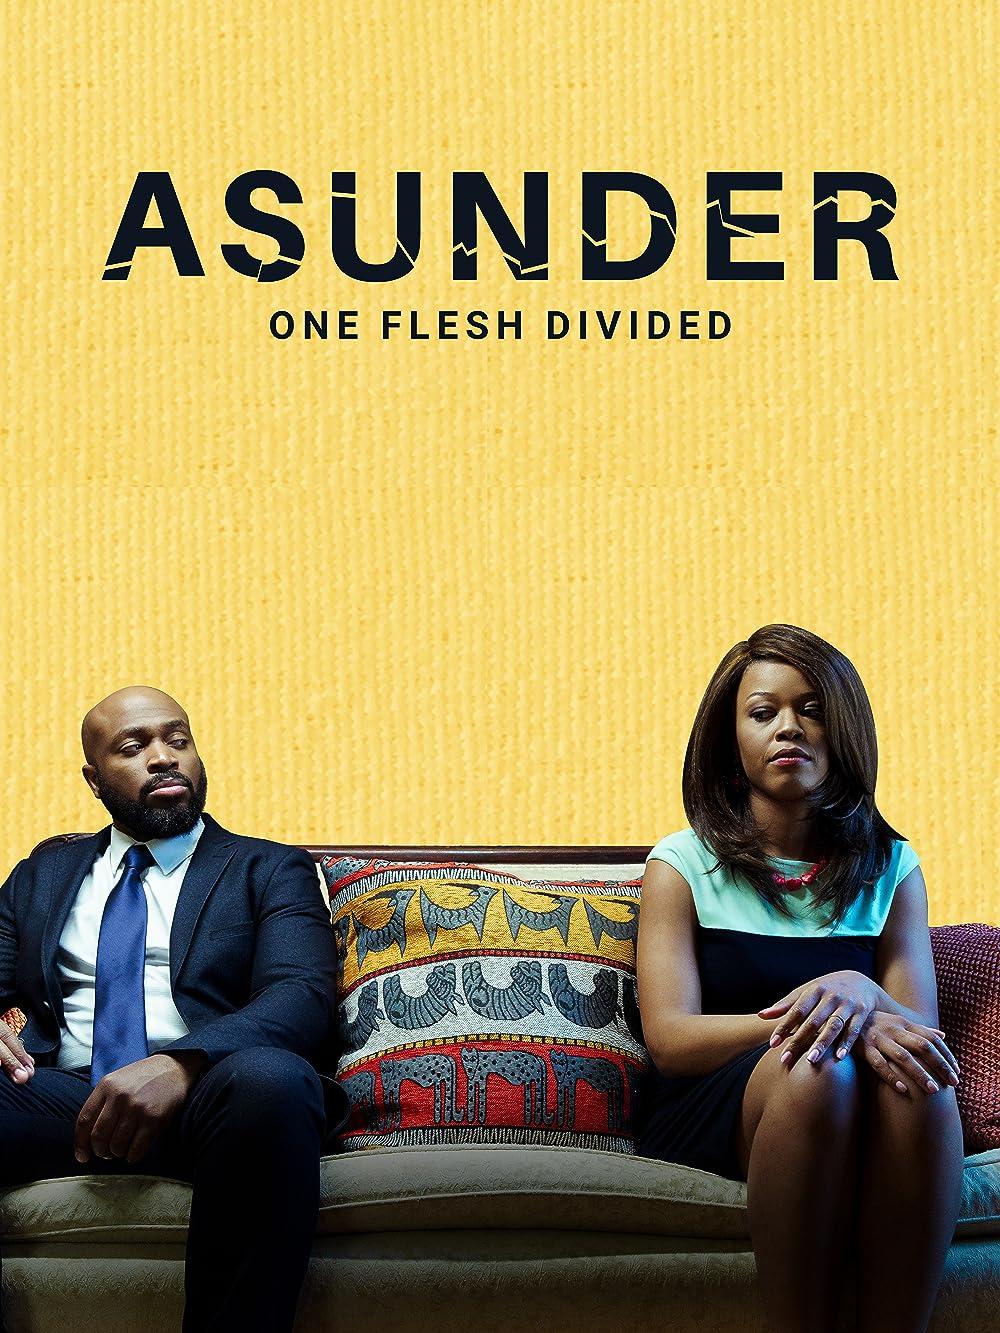 Asunder, One Flesh Divided 2020 English 720p HDRip 800MB | 300MB Download